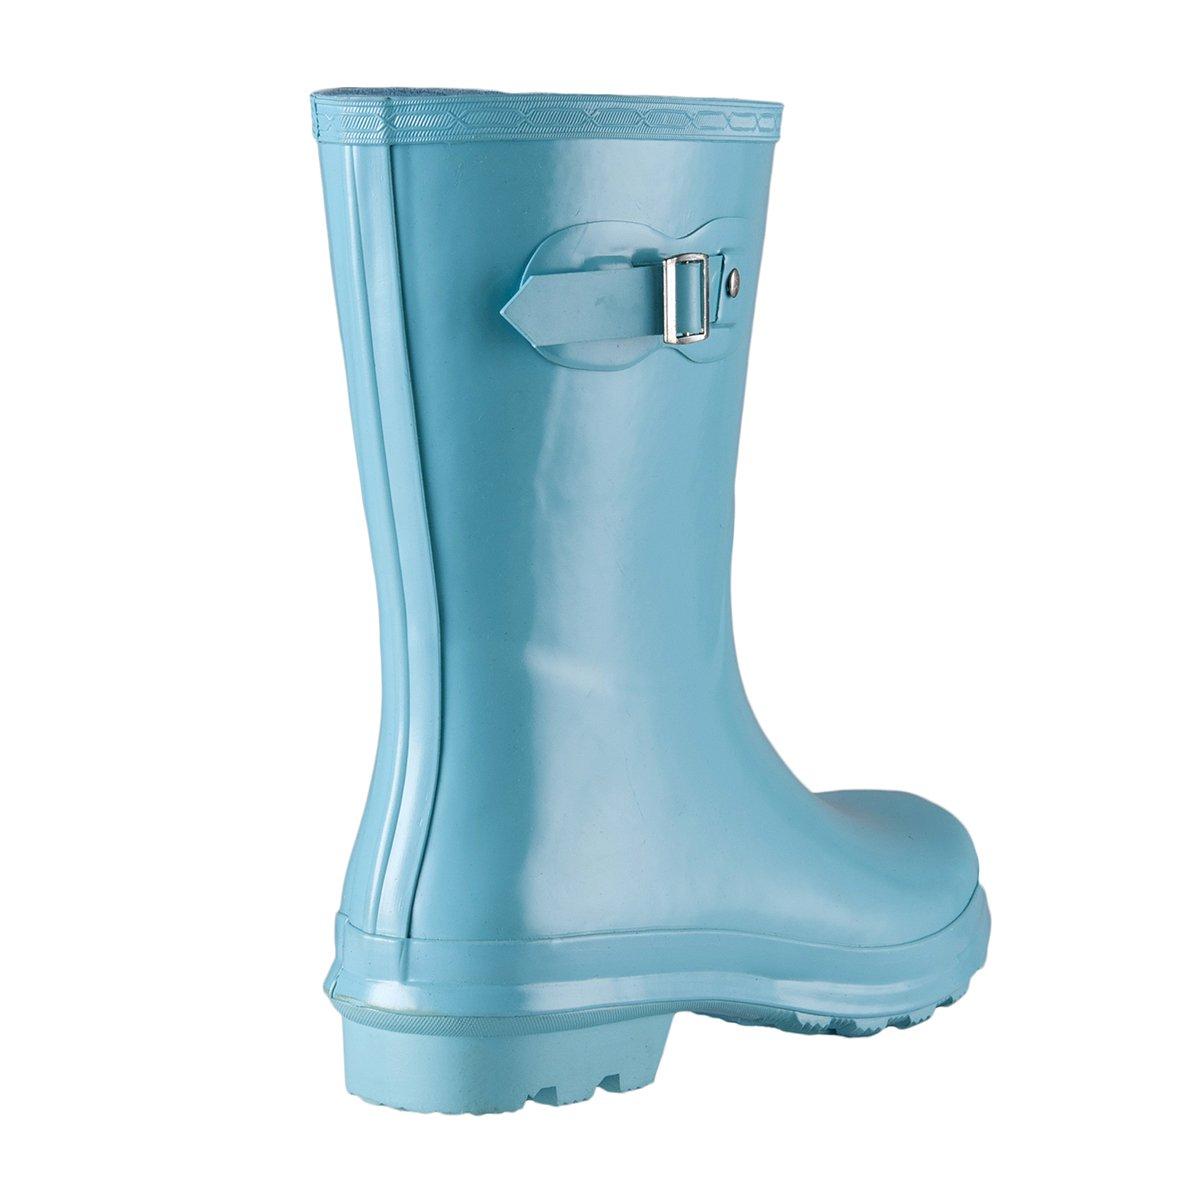 WTW Womens Original Short Gloss Rubber Rain Boots for Girls Rainy Day CHN-28-10 US